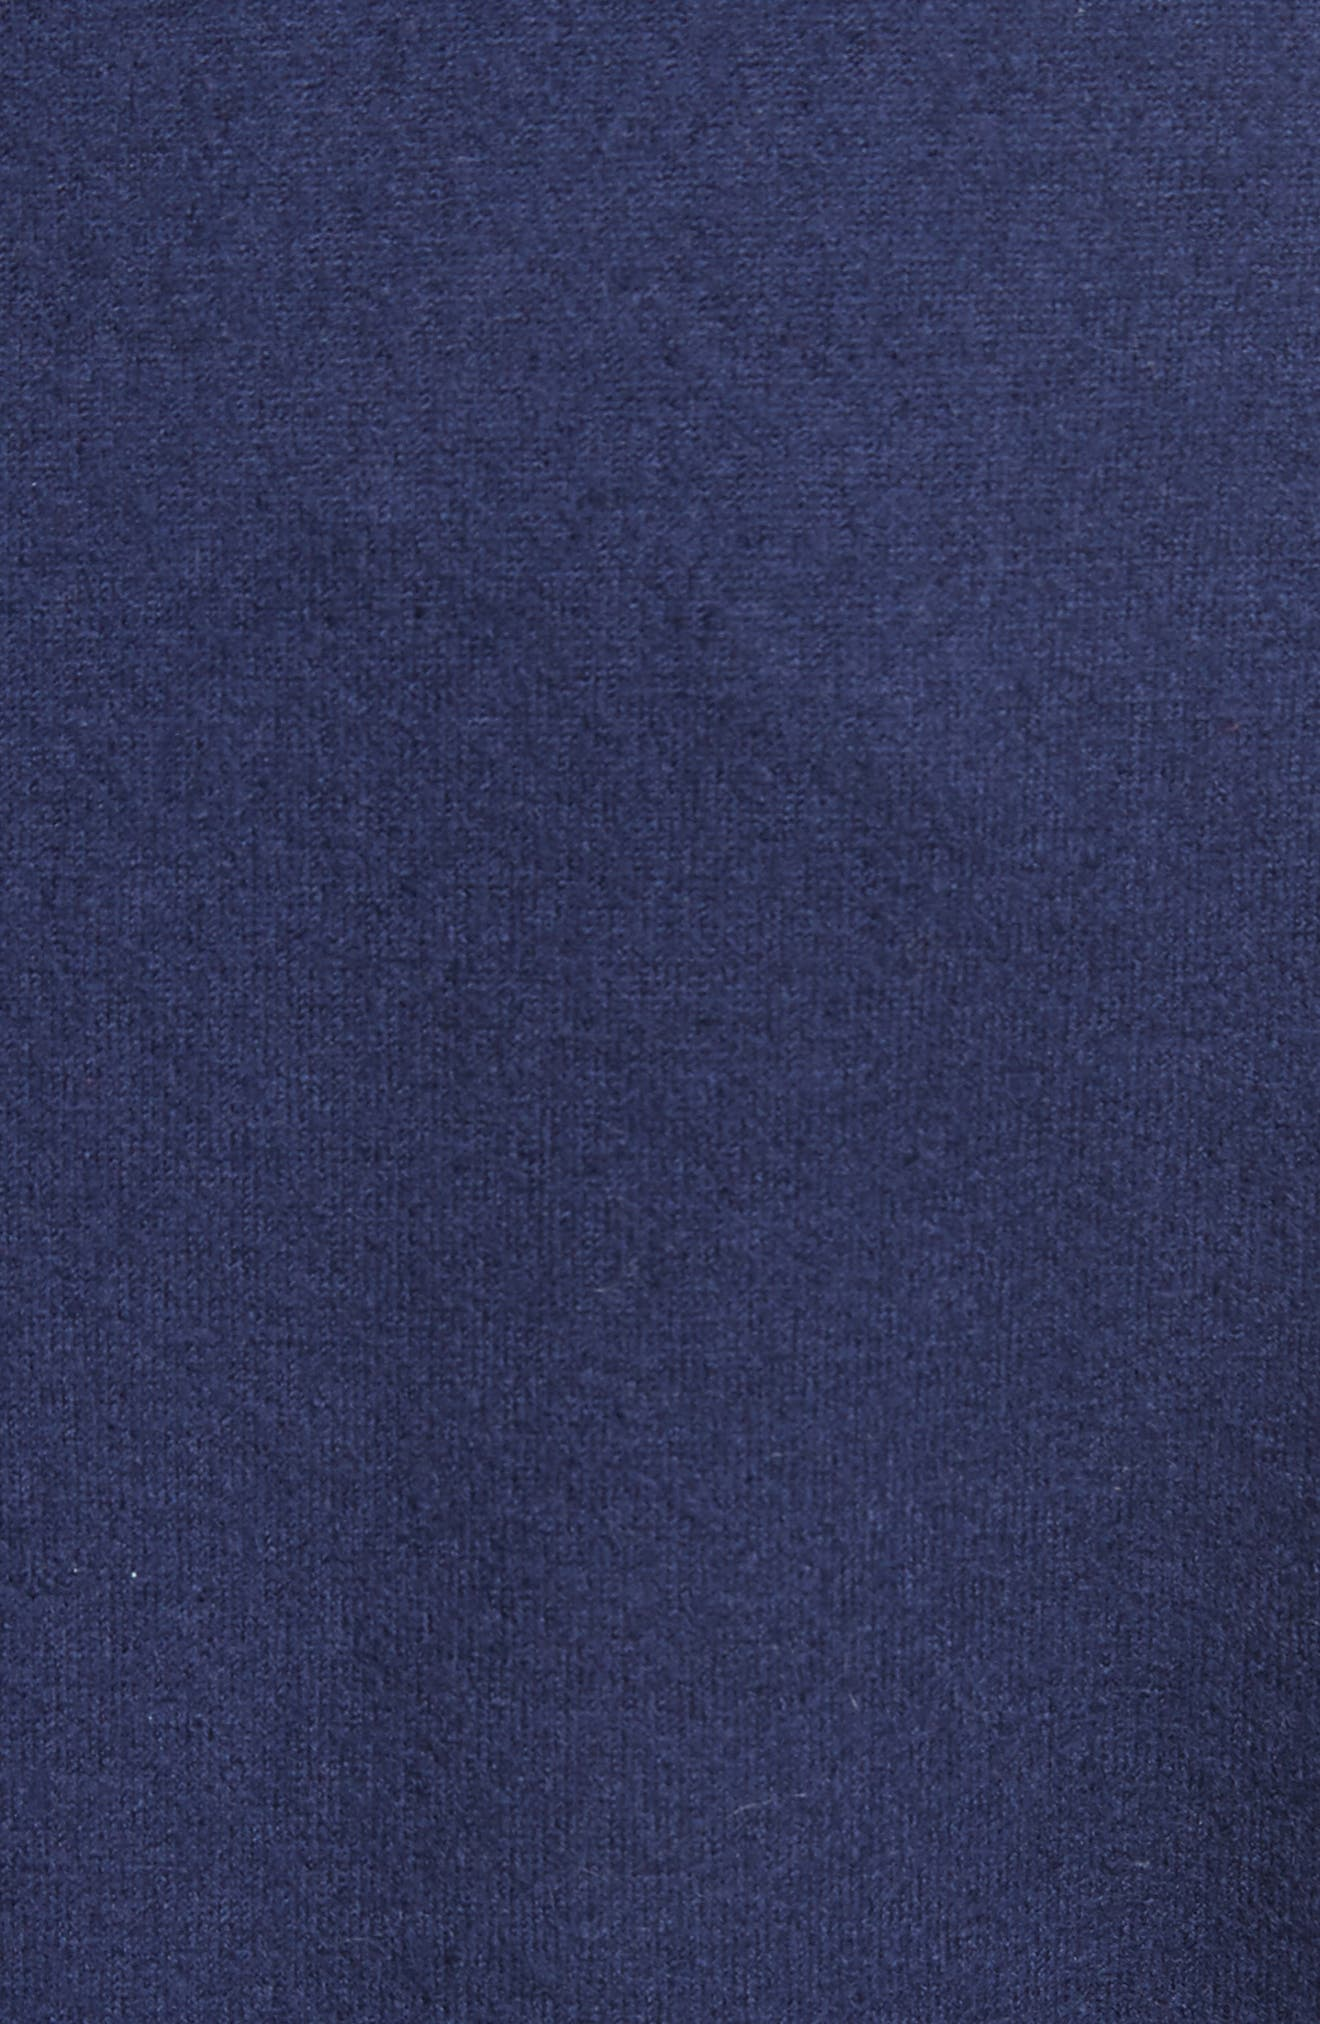 Club Wool Jacket,                             Alternate thumbnail 5, color,                             403